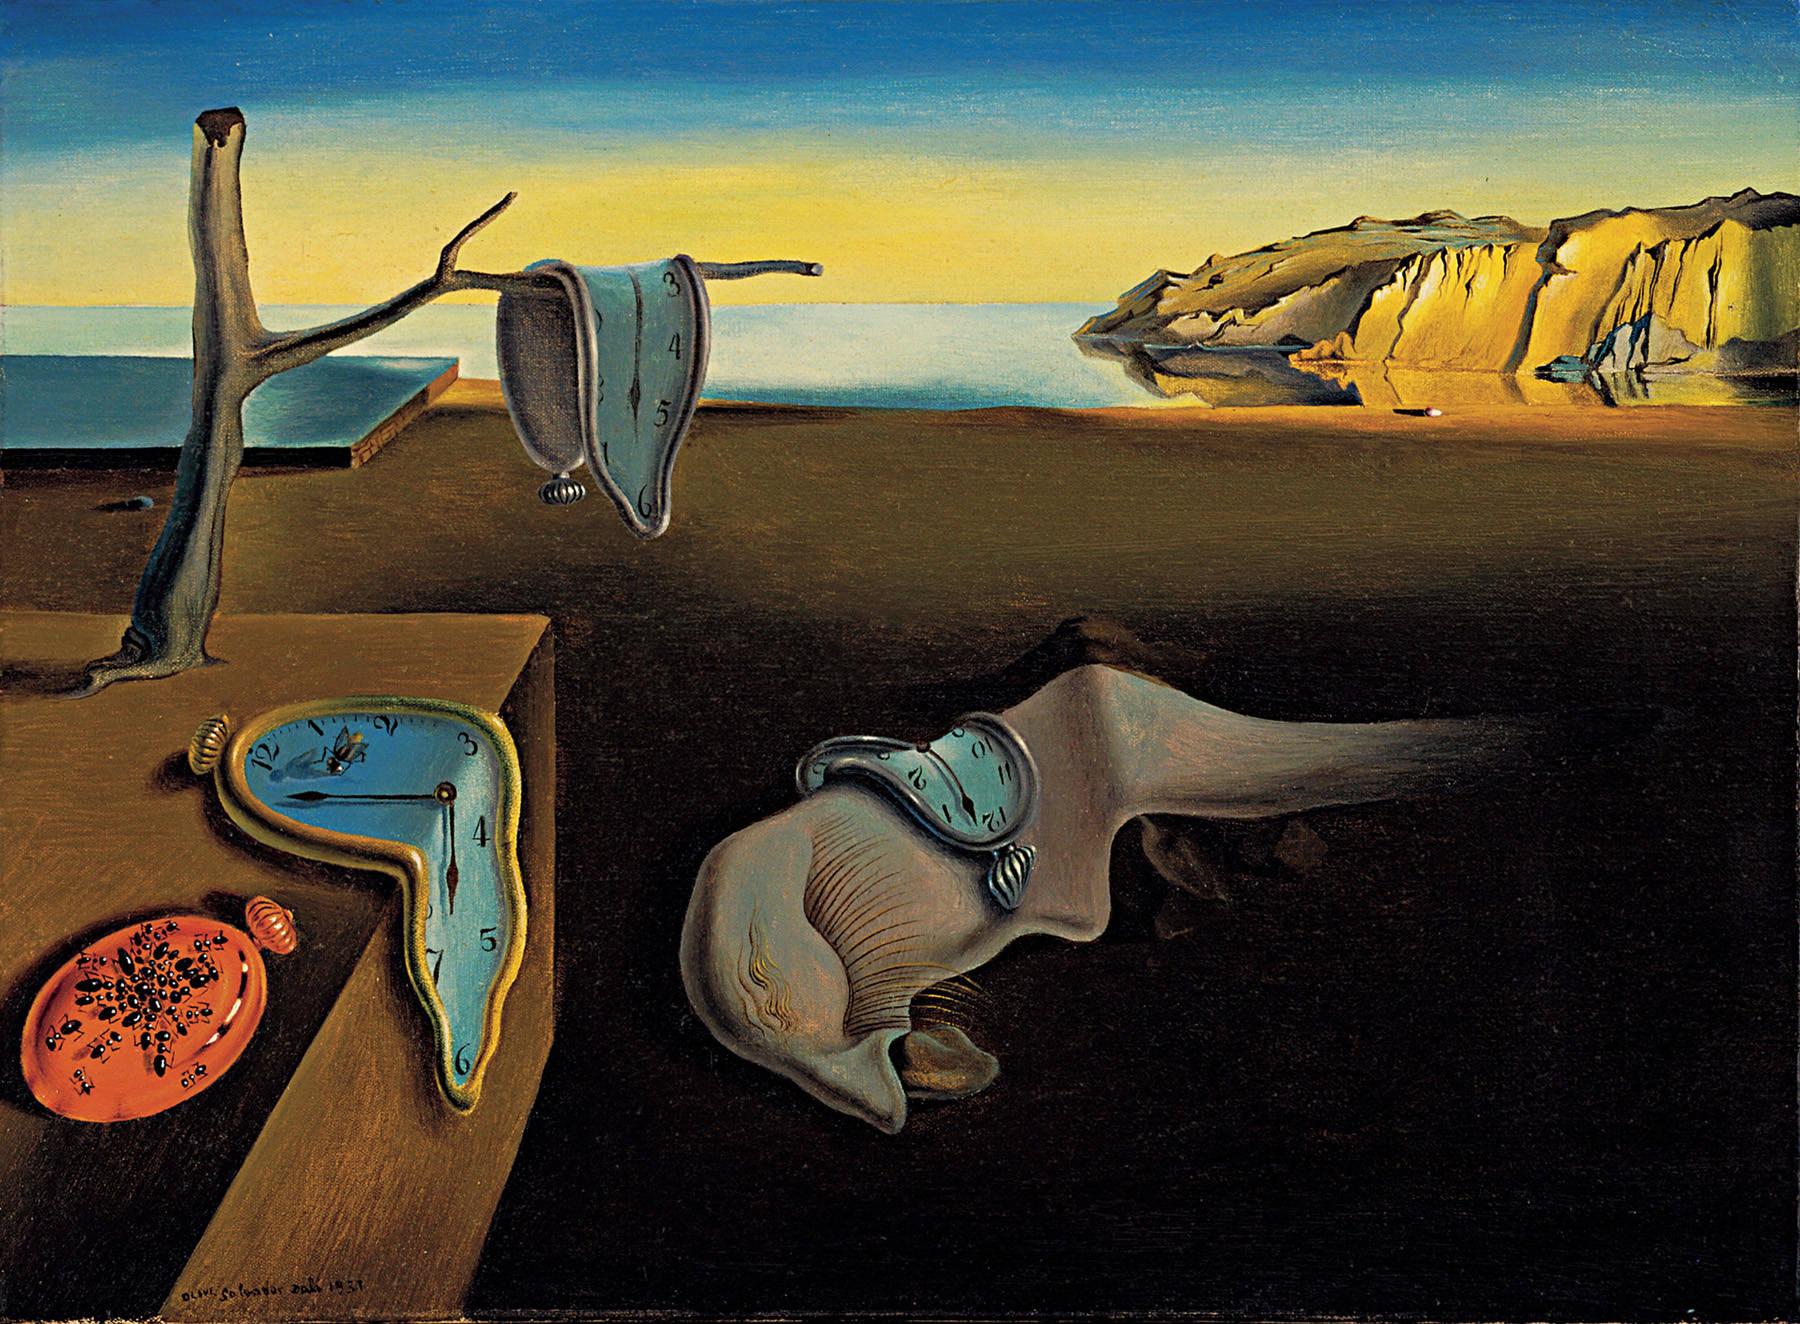 Salvador Dali's famous melting clock painting.